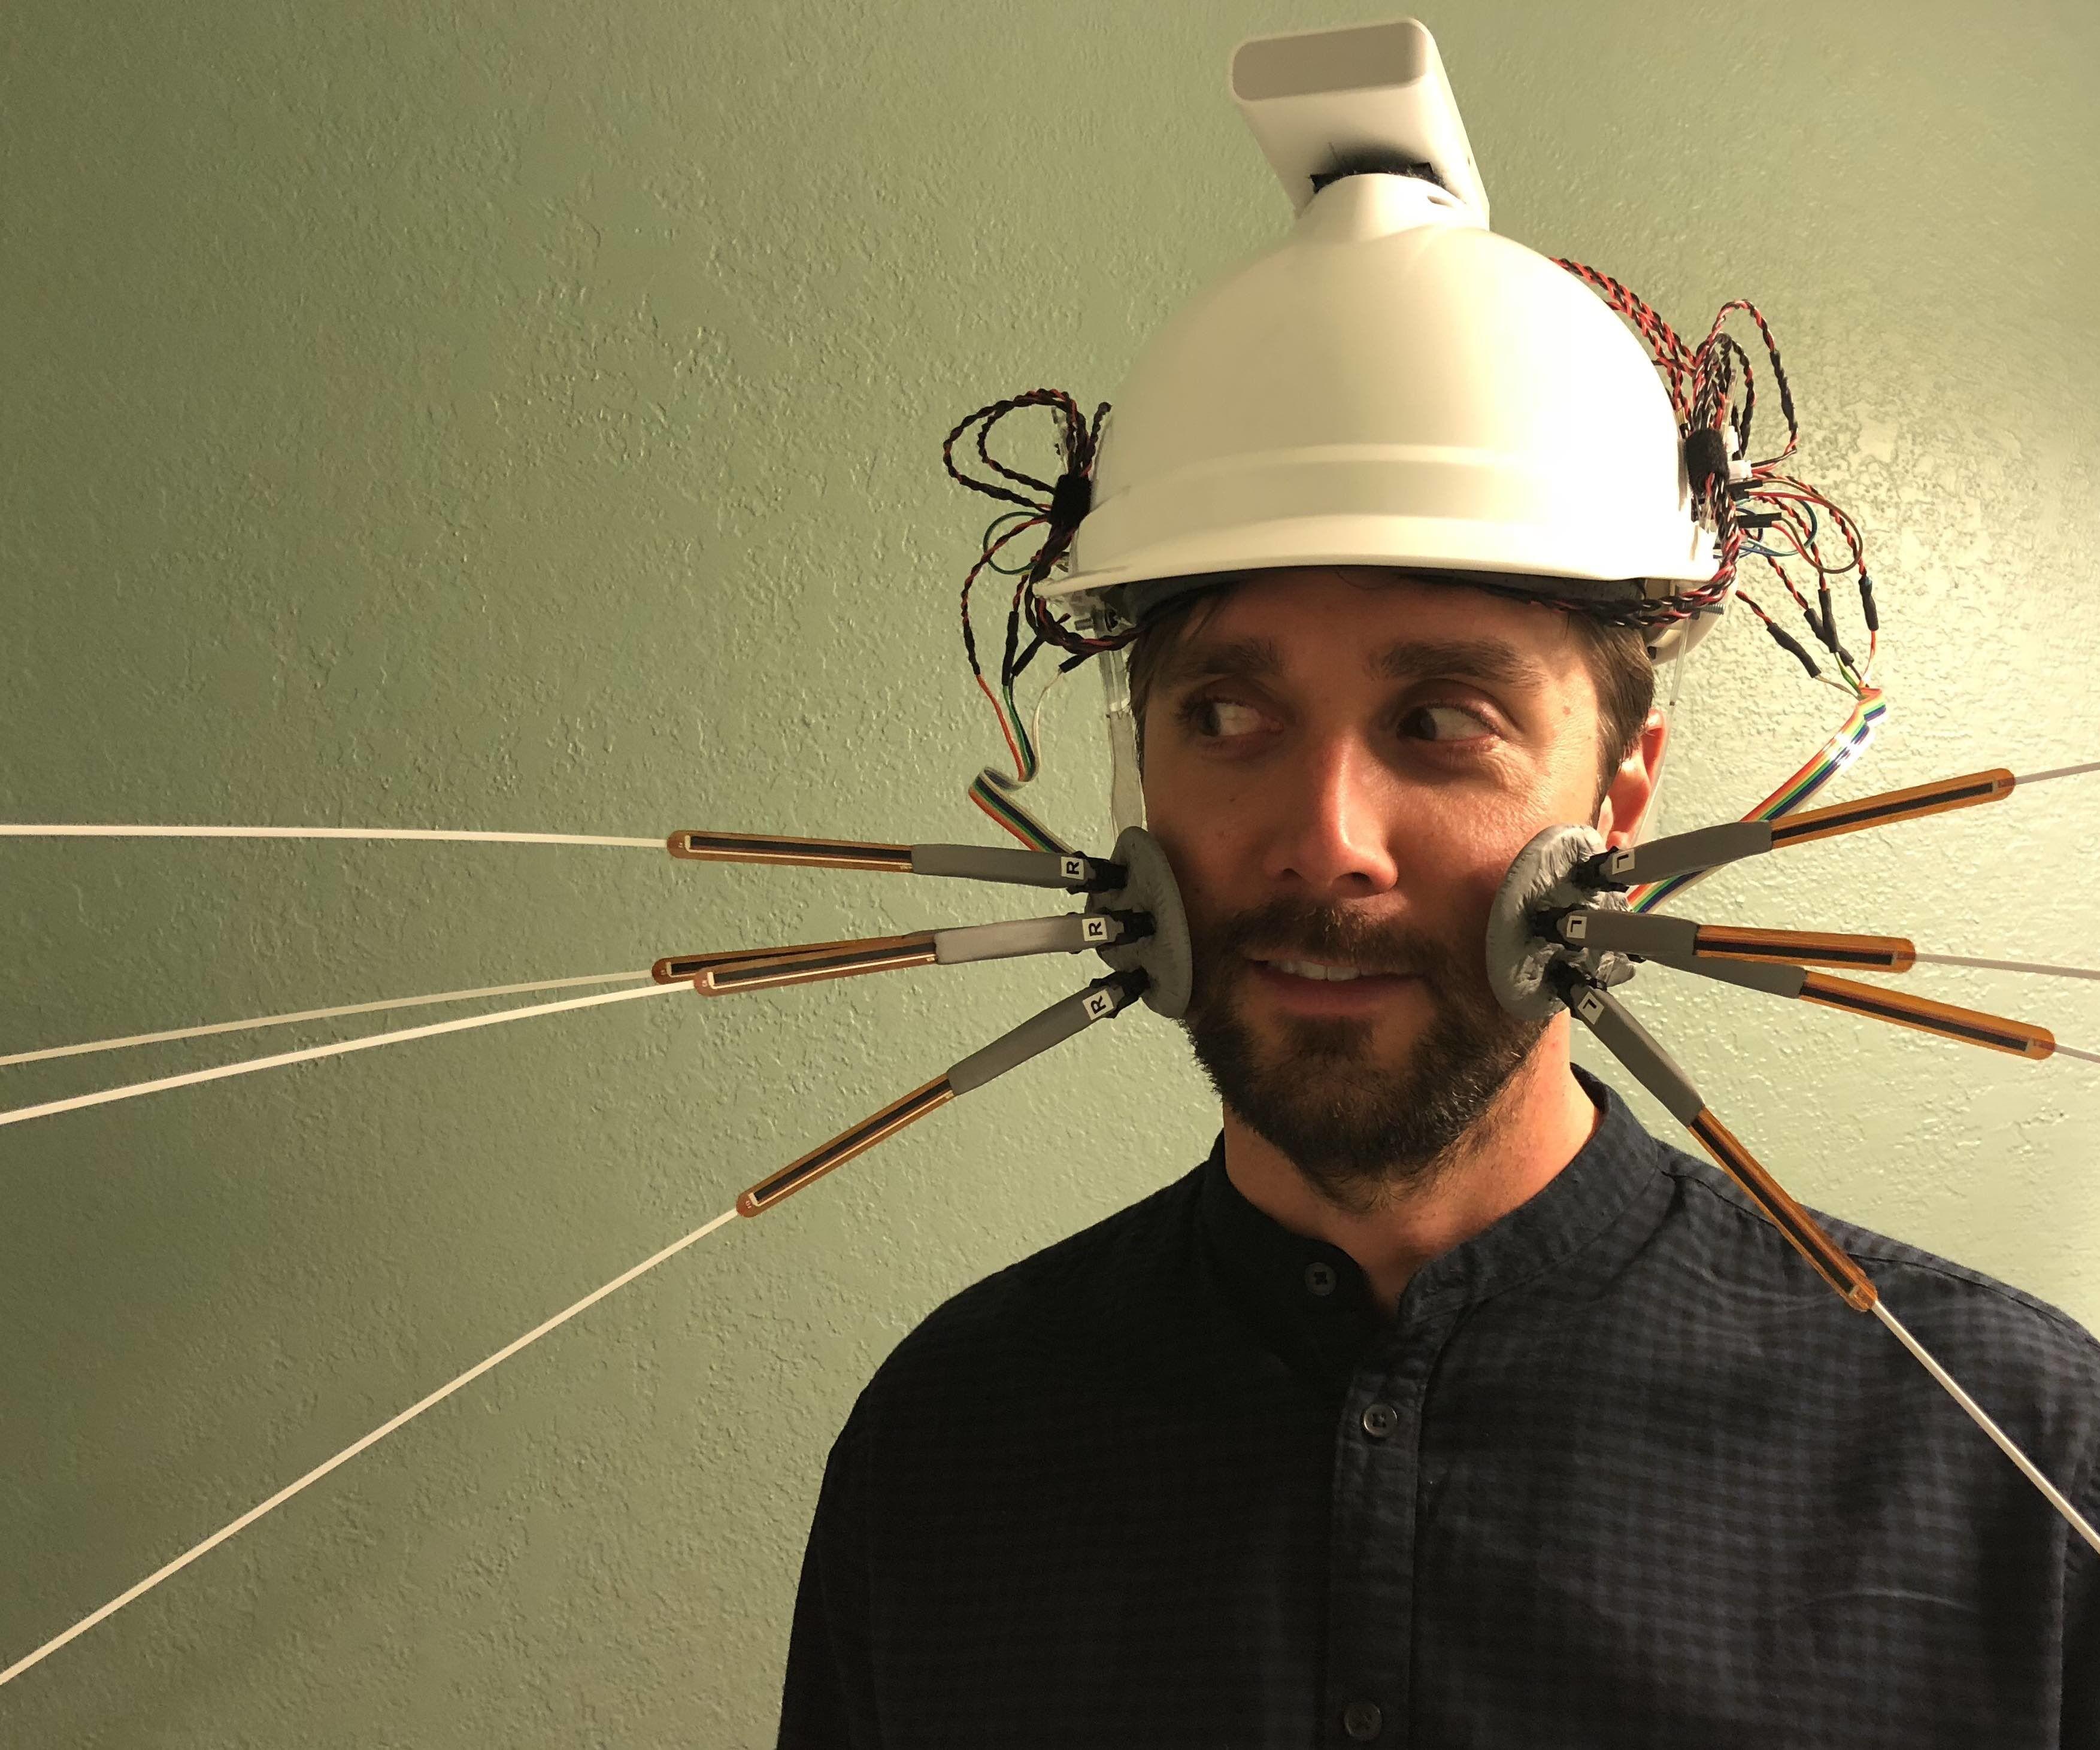 Whisker Sensory Extension Wearable